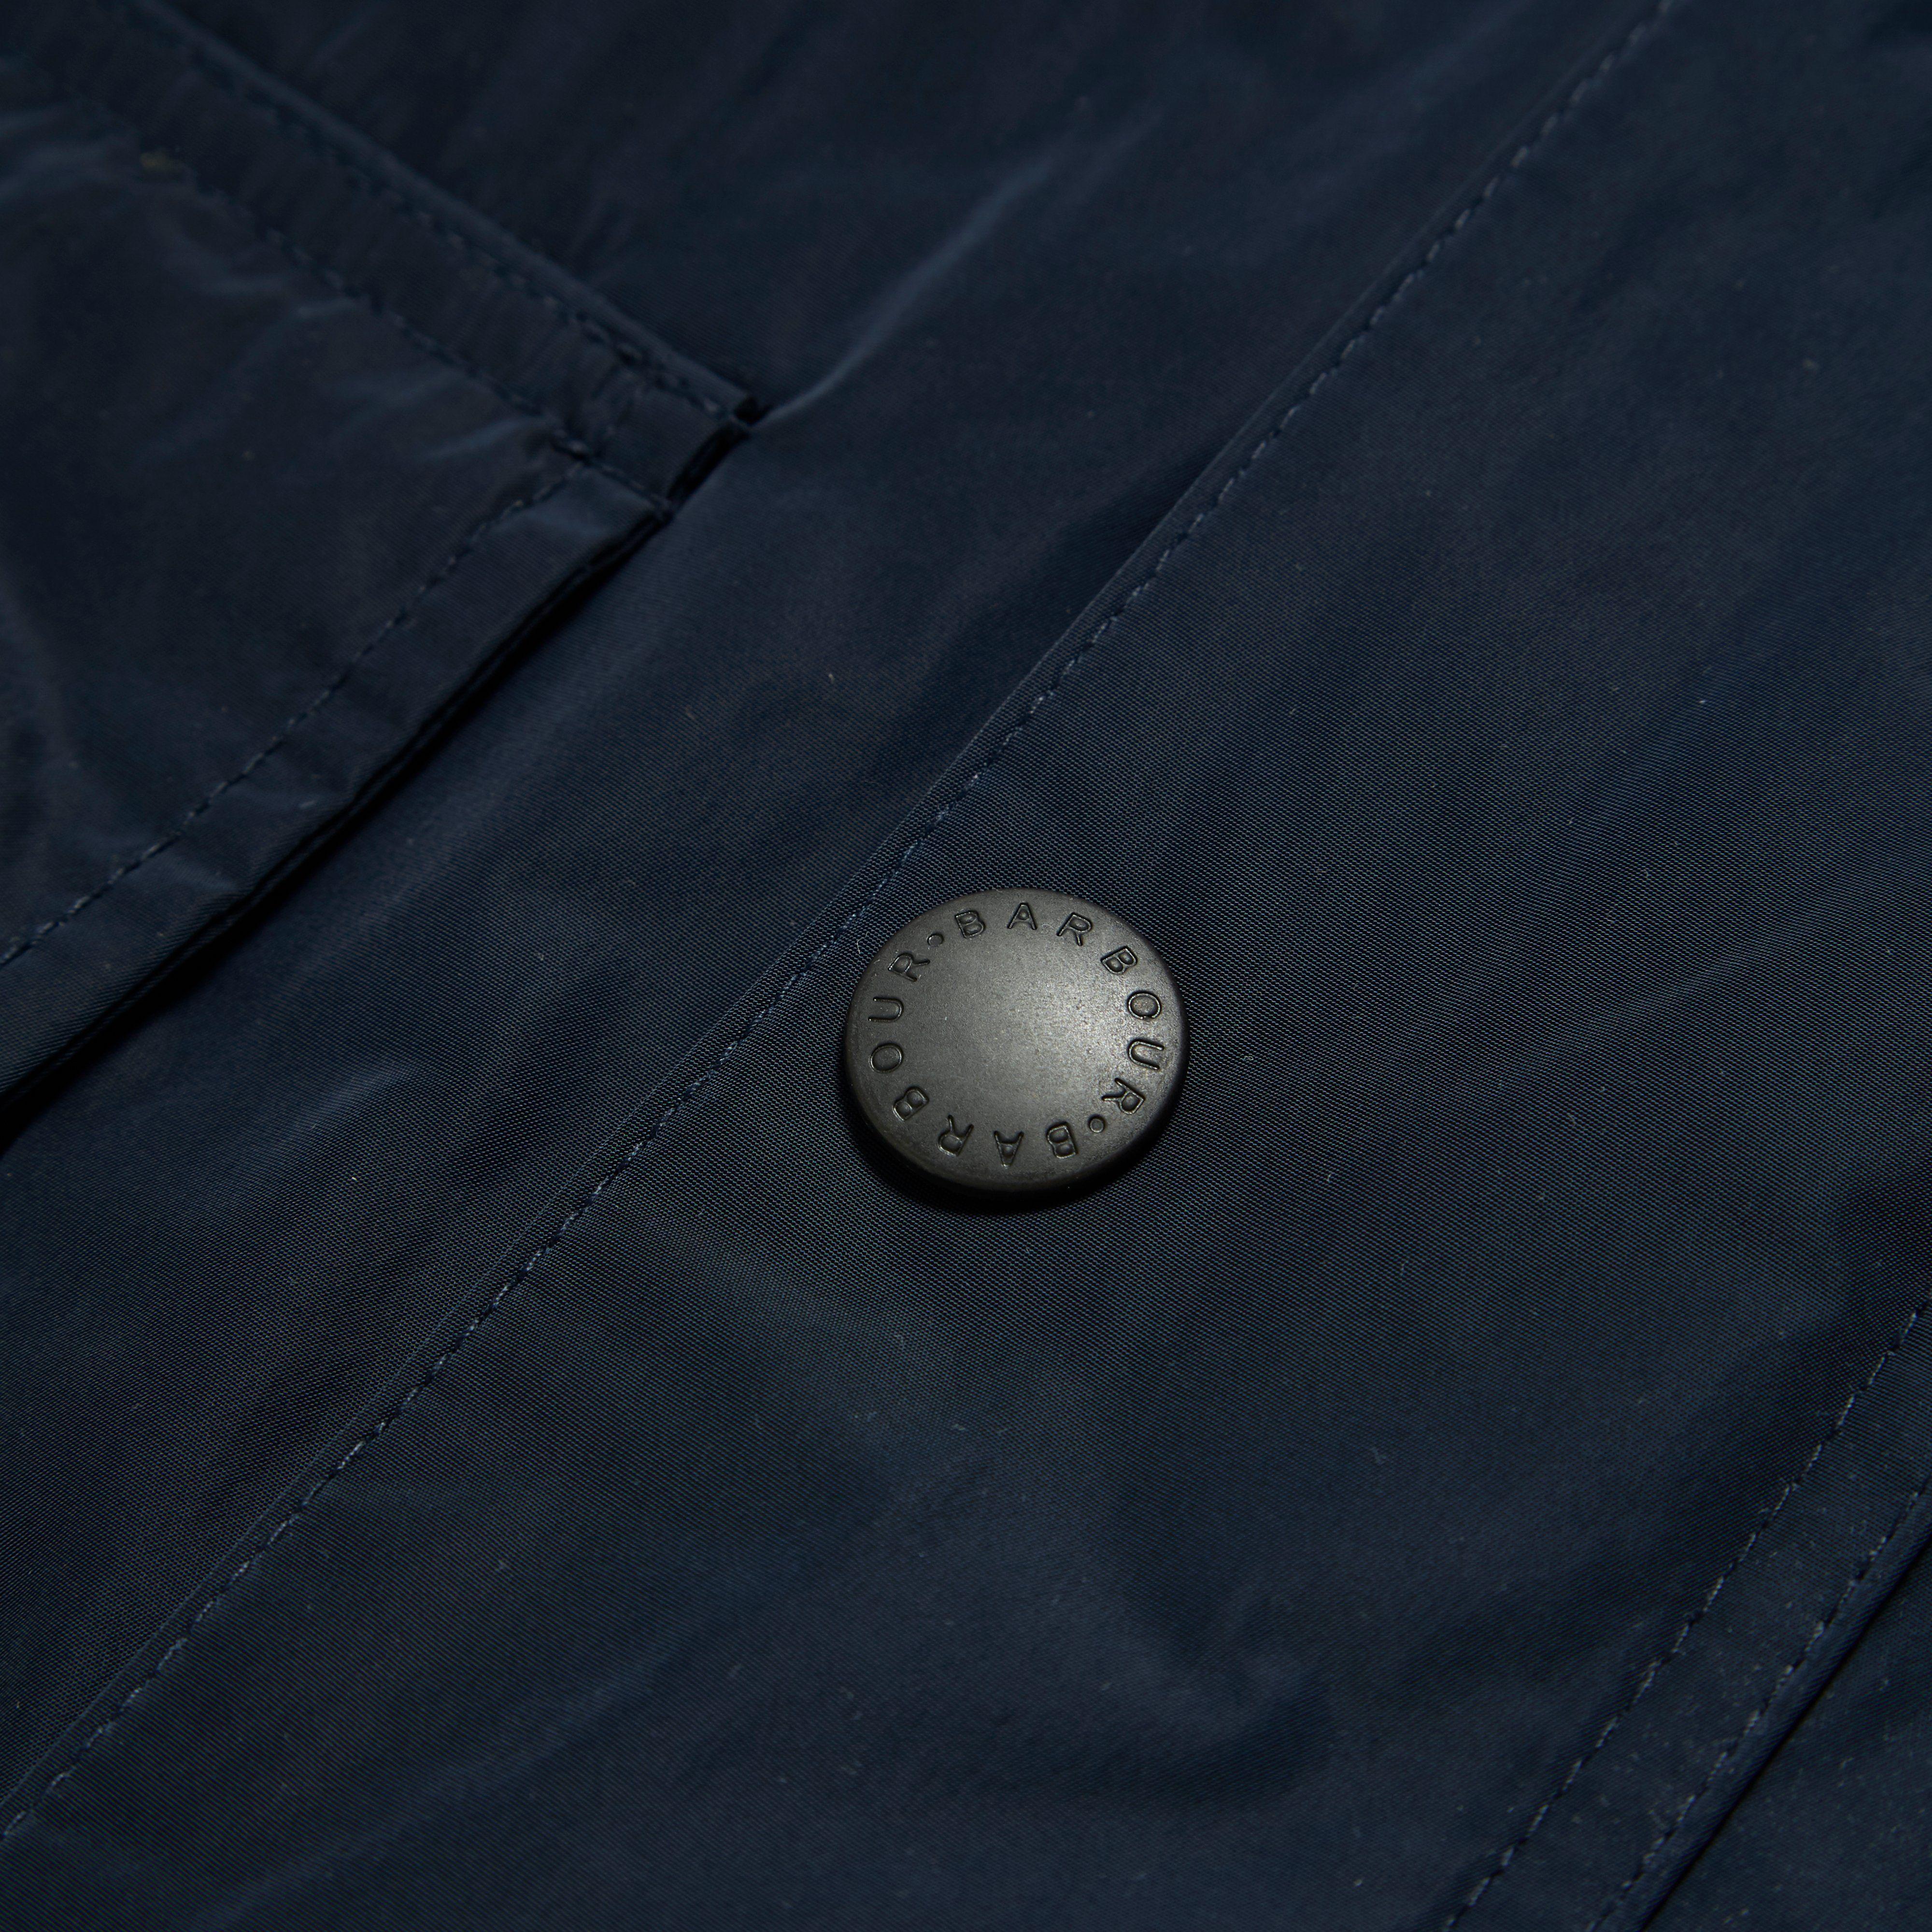 Barbour SL Bedale Jacket